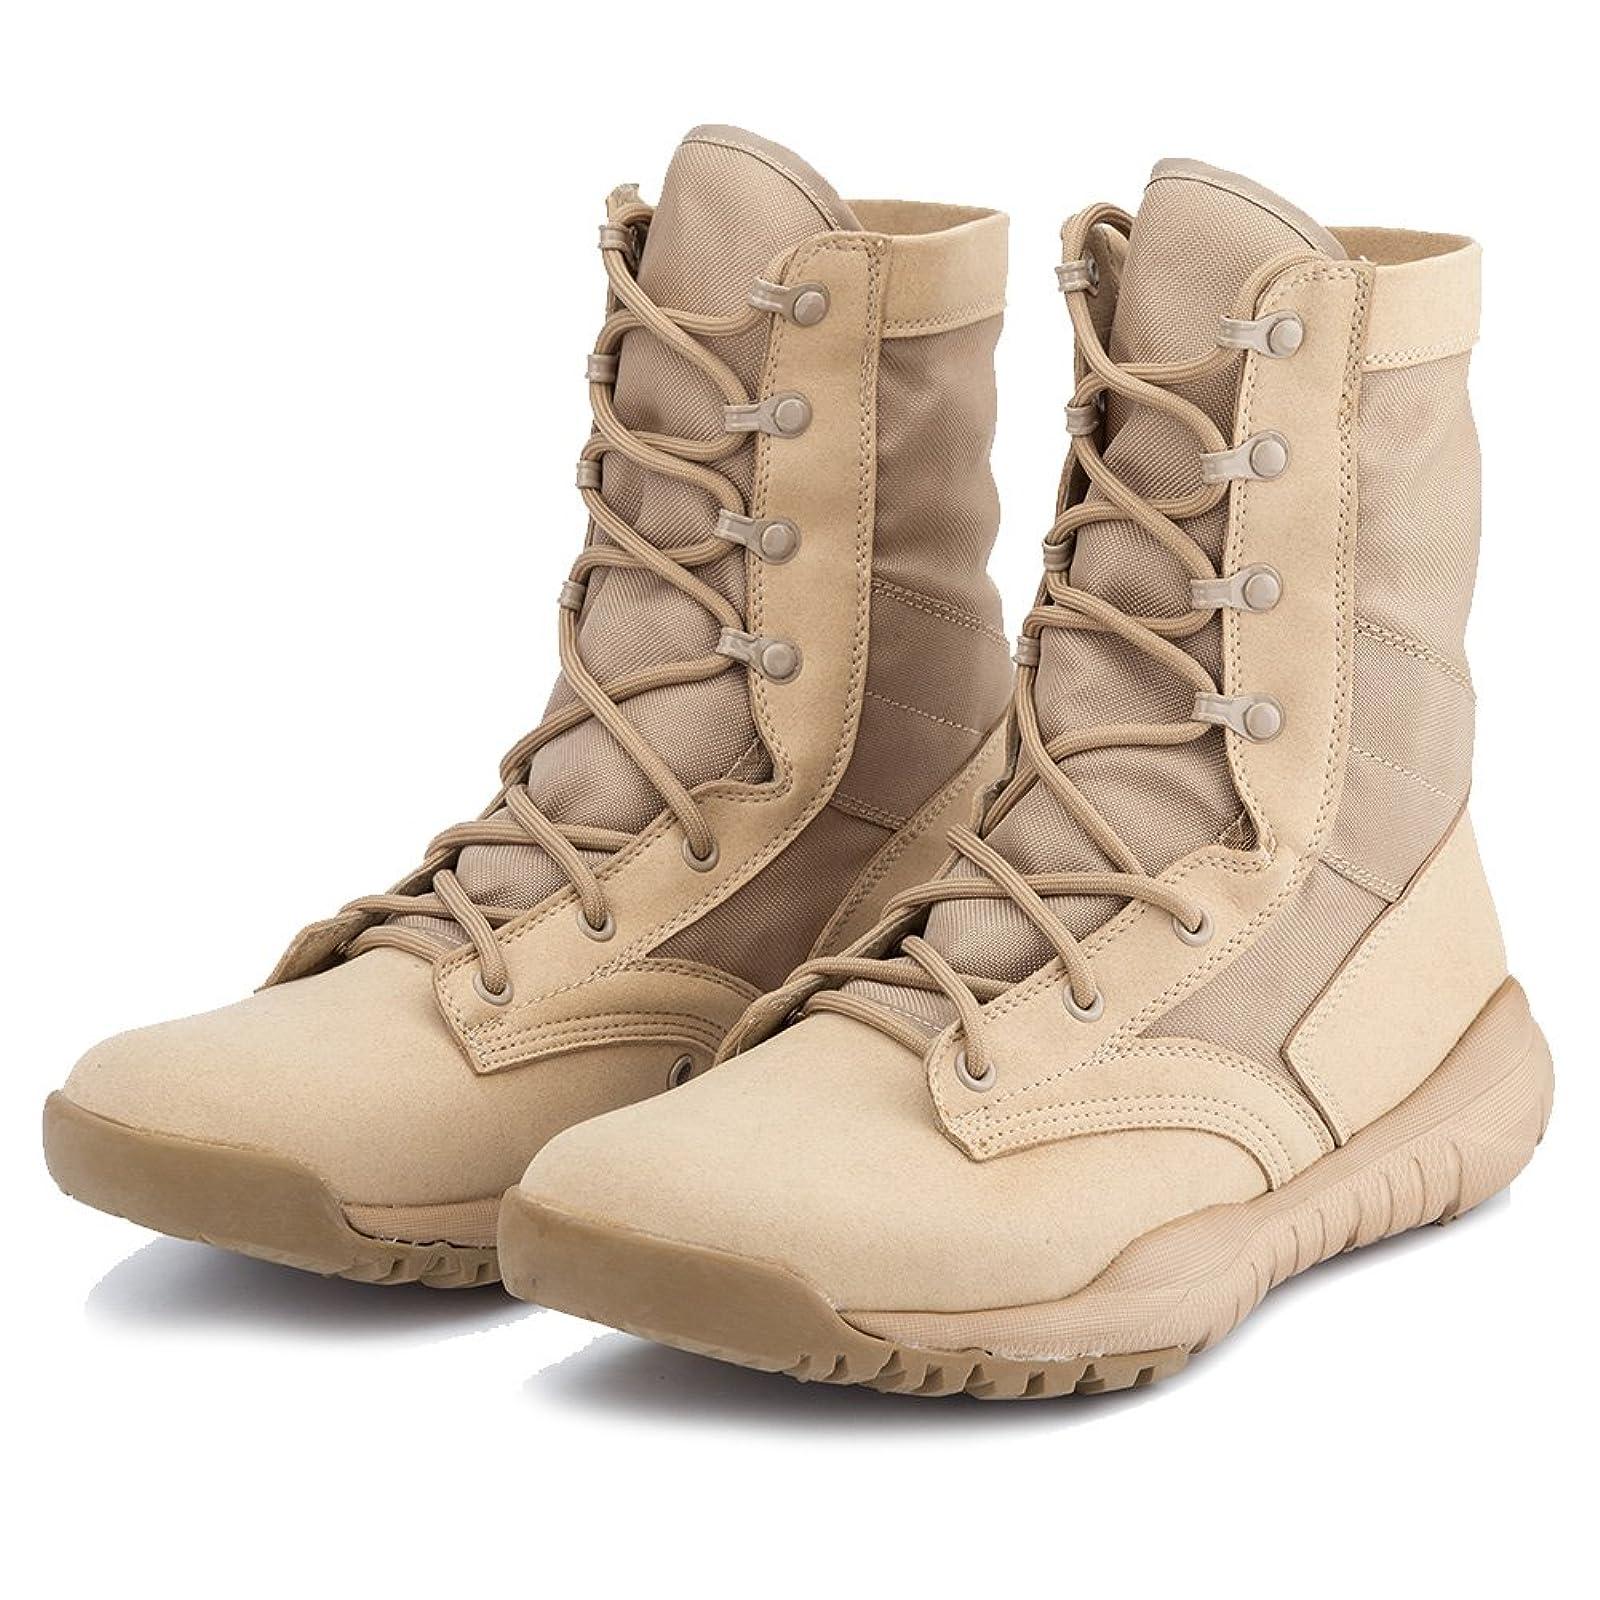 IODSON US Mens' Ultra-Light Combat Boots Beige 9.5 M US - 2